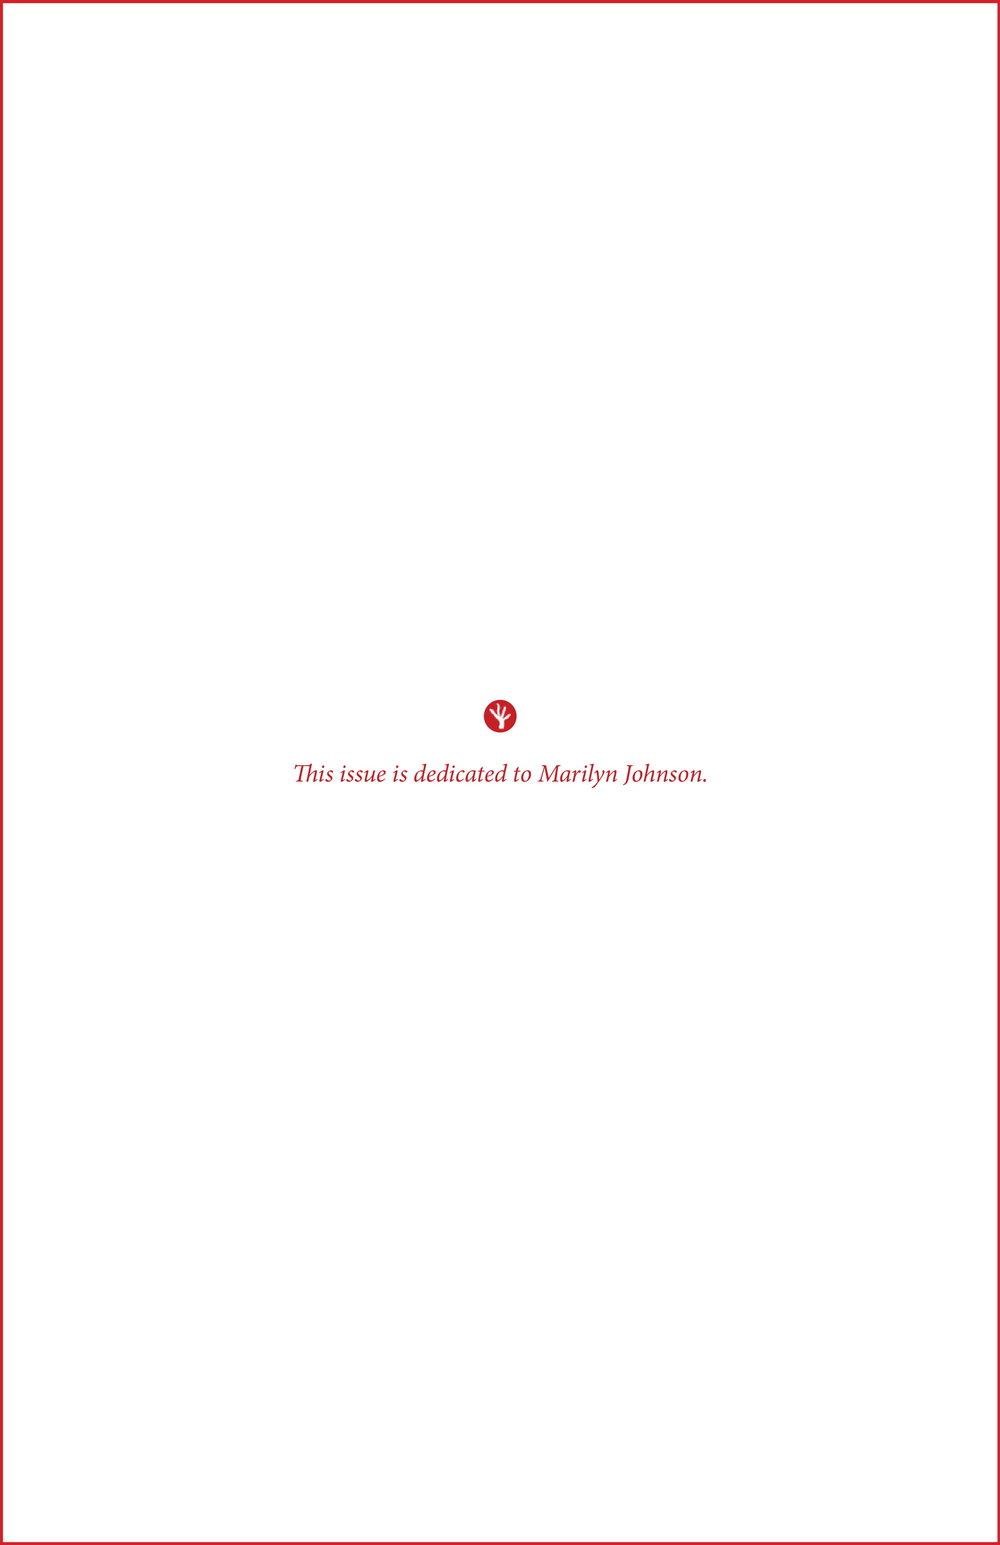 Shrew Issue 7.4-03.jpg